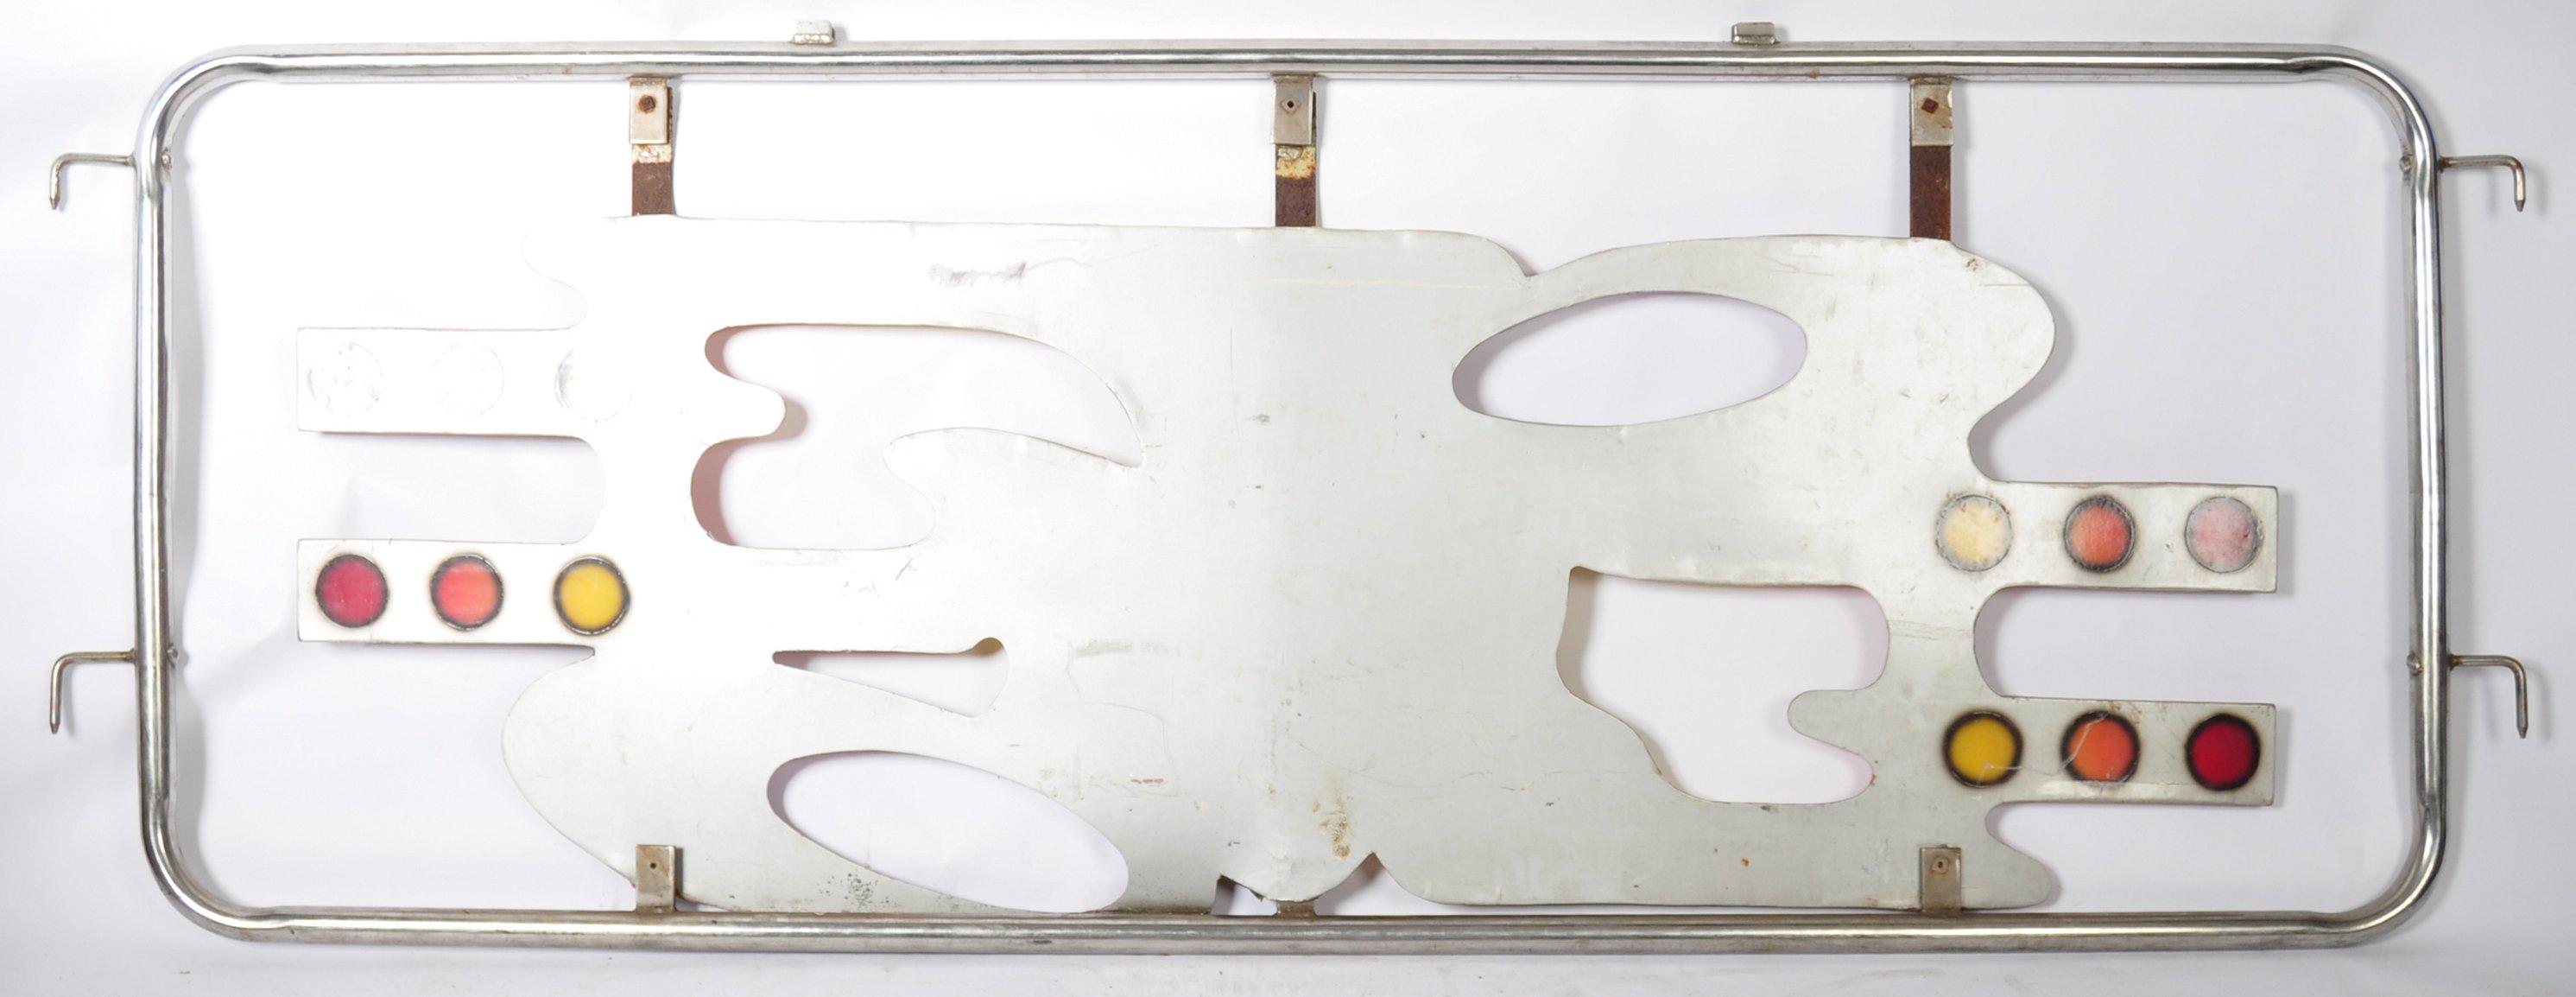 ORIGINAL FAIRGROUND / FUNFAIR OPEN PANELED FENCE / GATE - Image 5 of 6